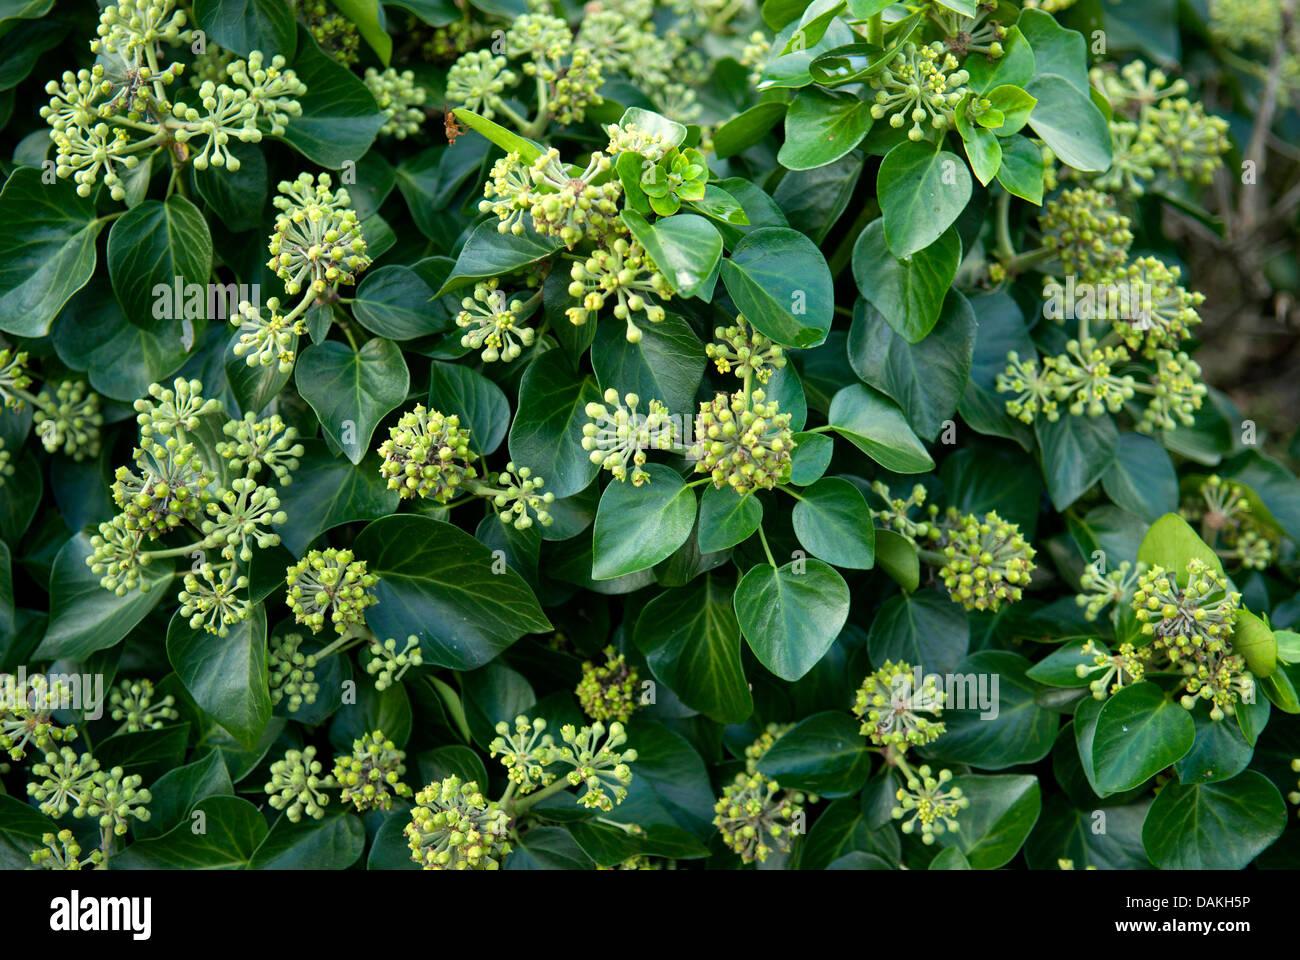 Ivy (Hedera helix 'Arbori Compact', Hedera helix Arbori Compact), cultivar Arbori Compact - Stock Image